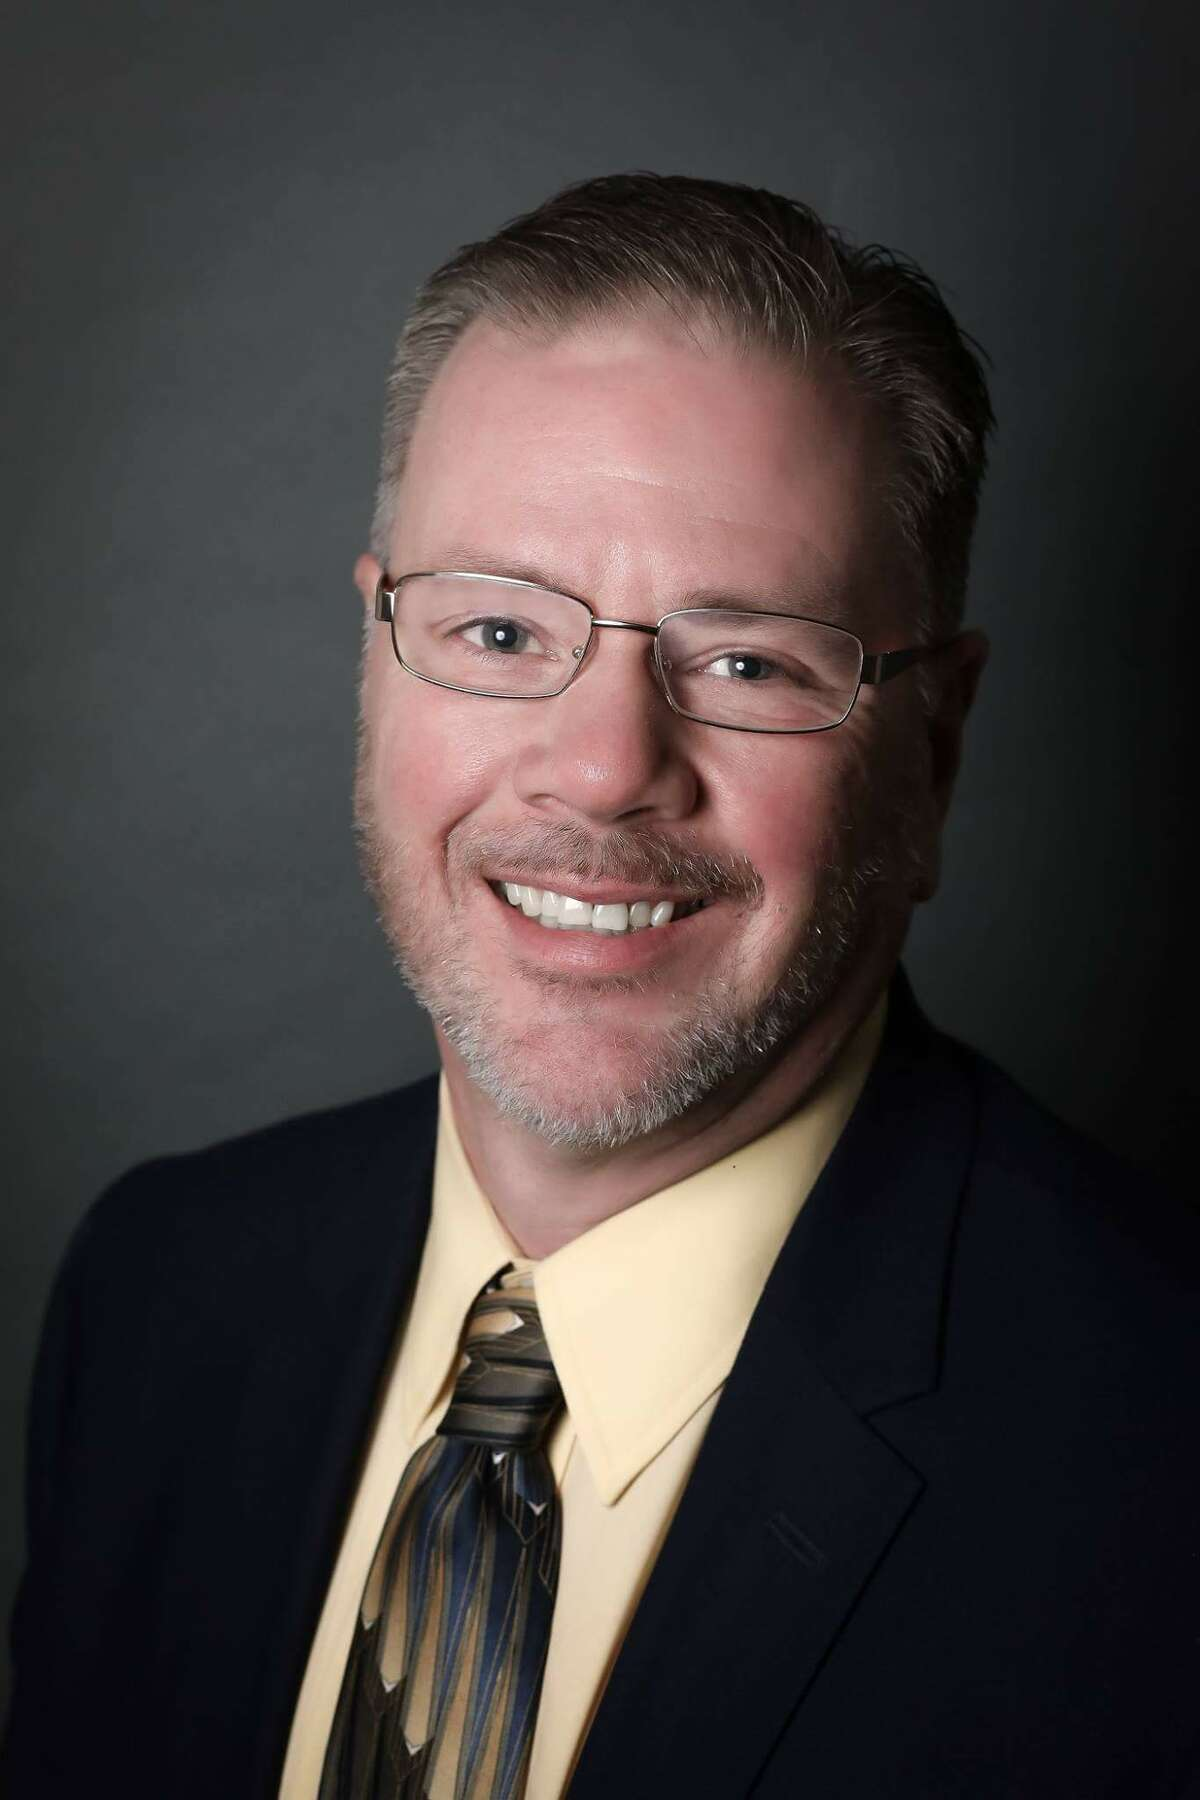 David Romero, (D), candidate for State Senate 7.